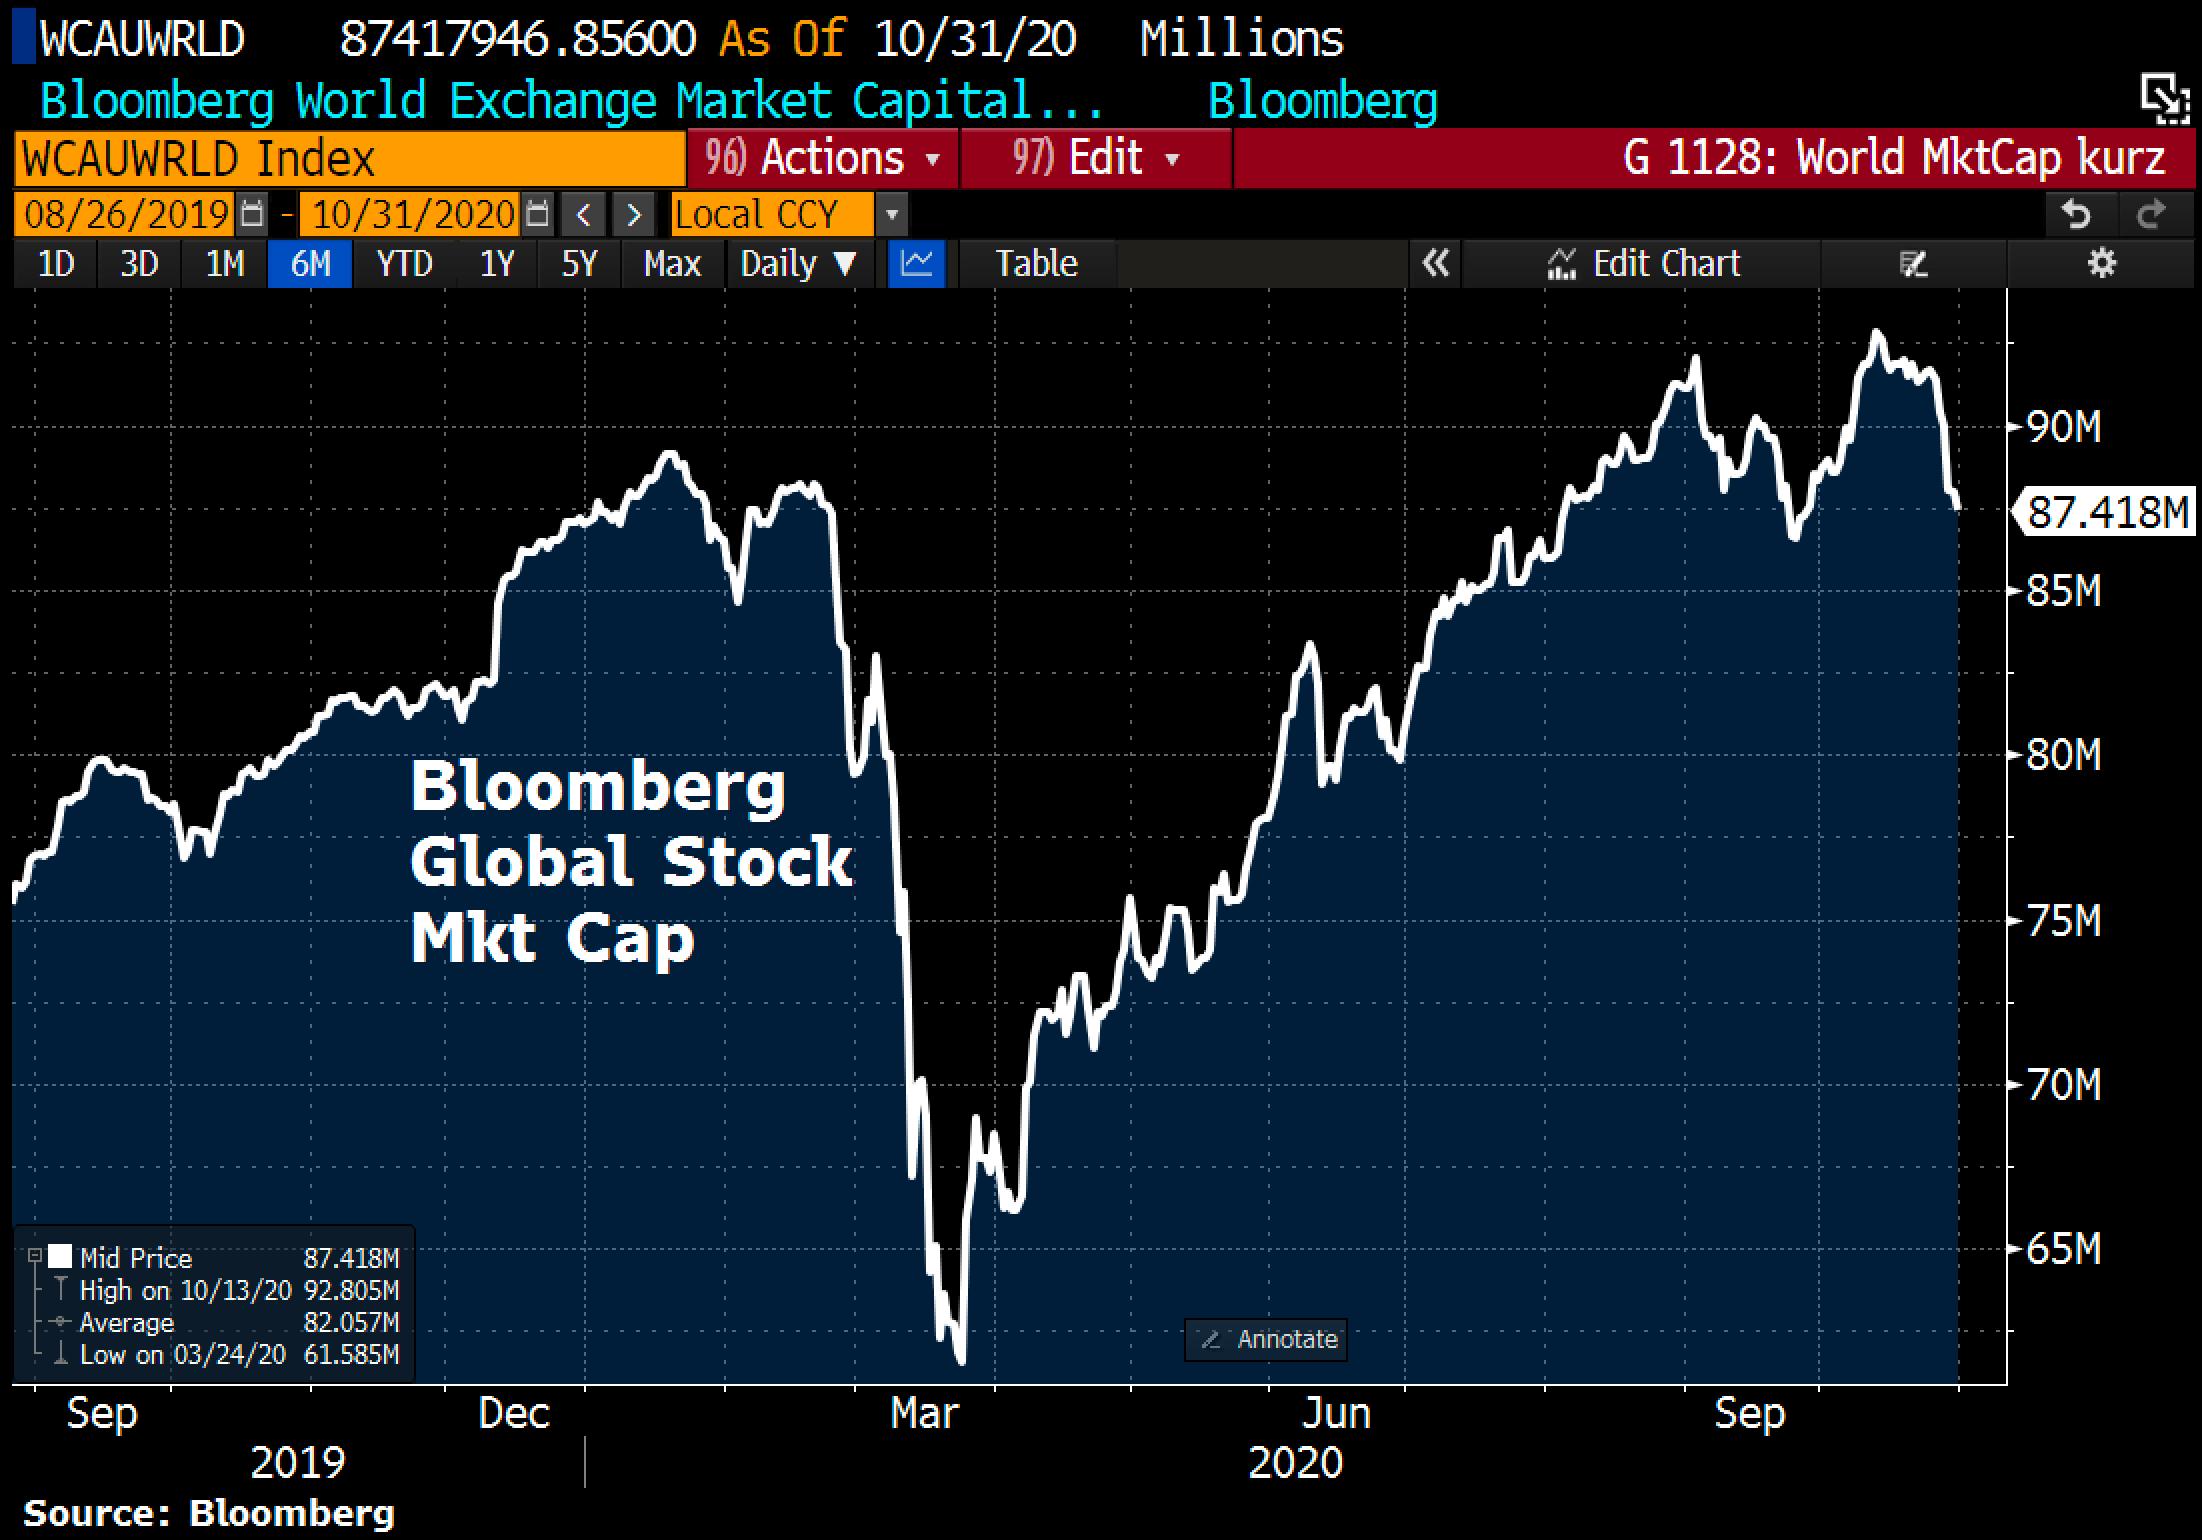 Global stocks market cap